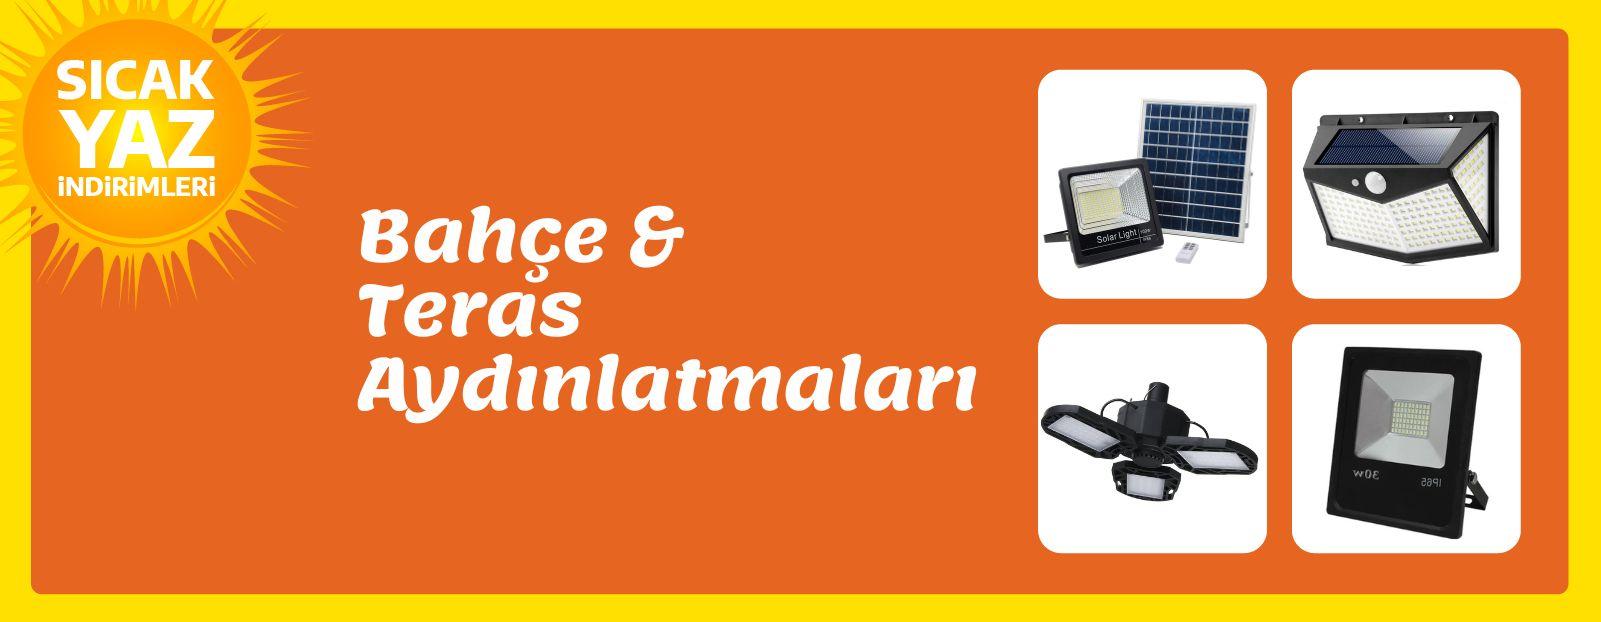 3Nesdersan.com bahçe ortahttps://www.nesdersan.com/Kategori/bahce-mobilyalari